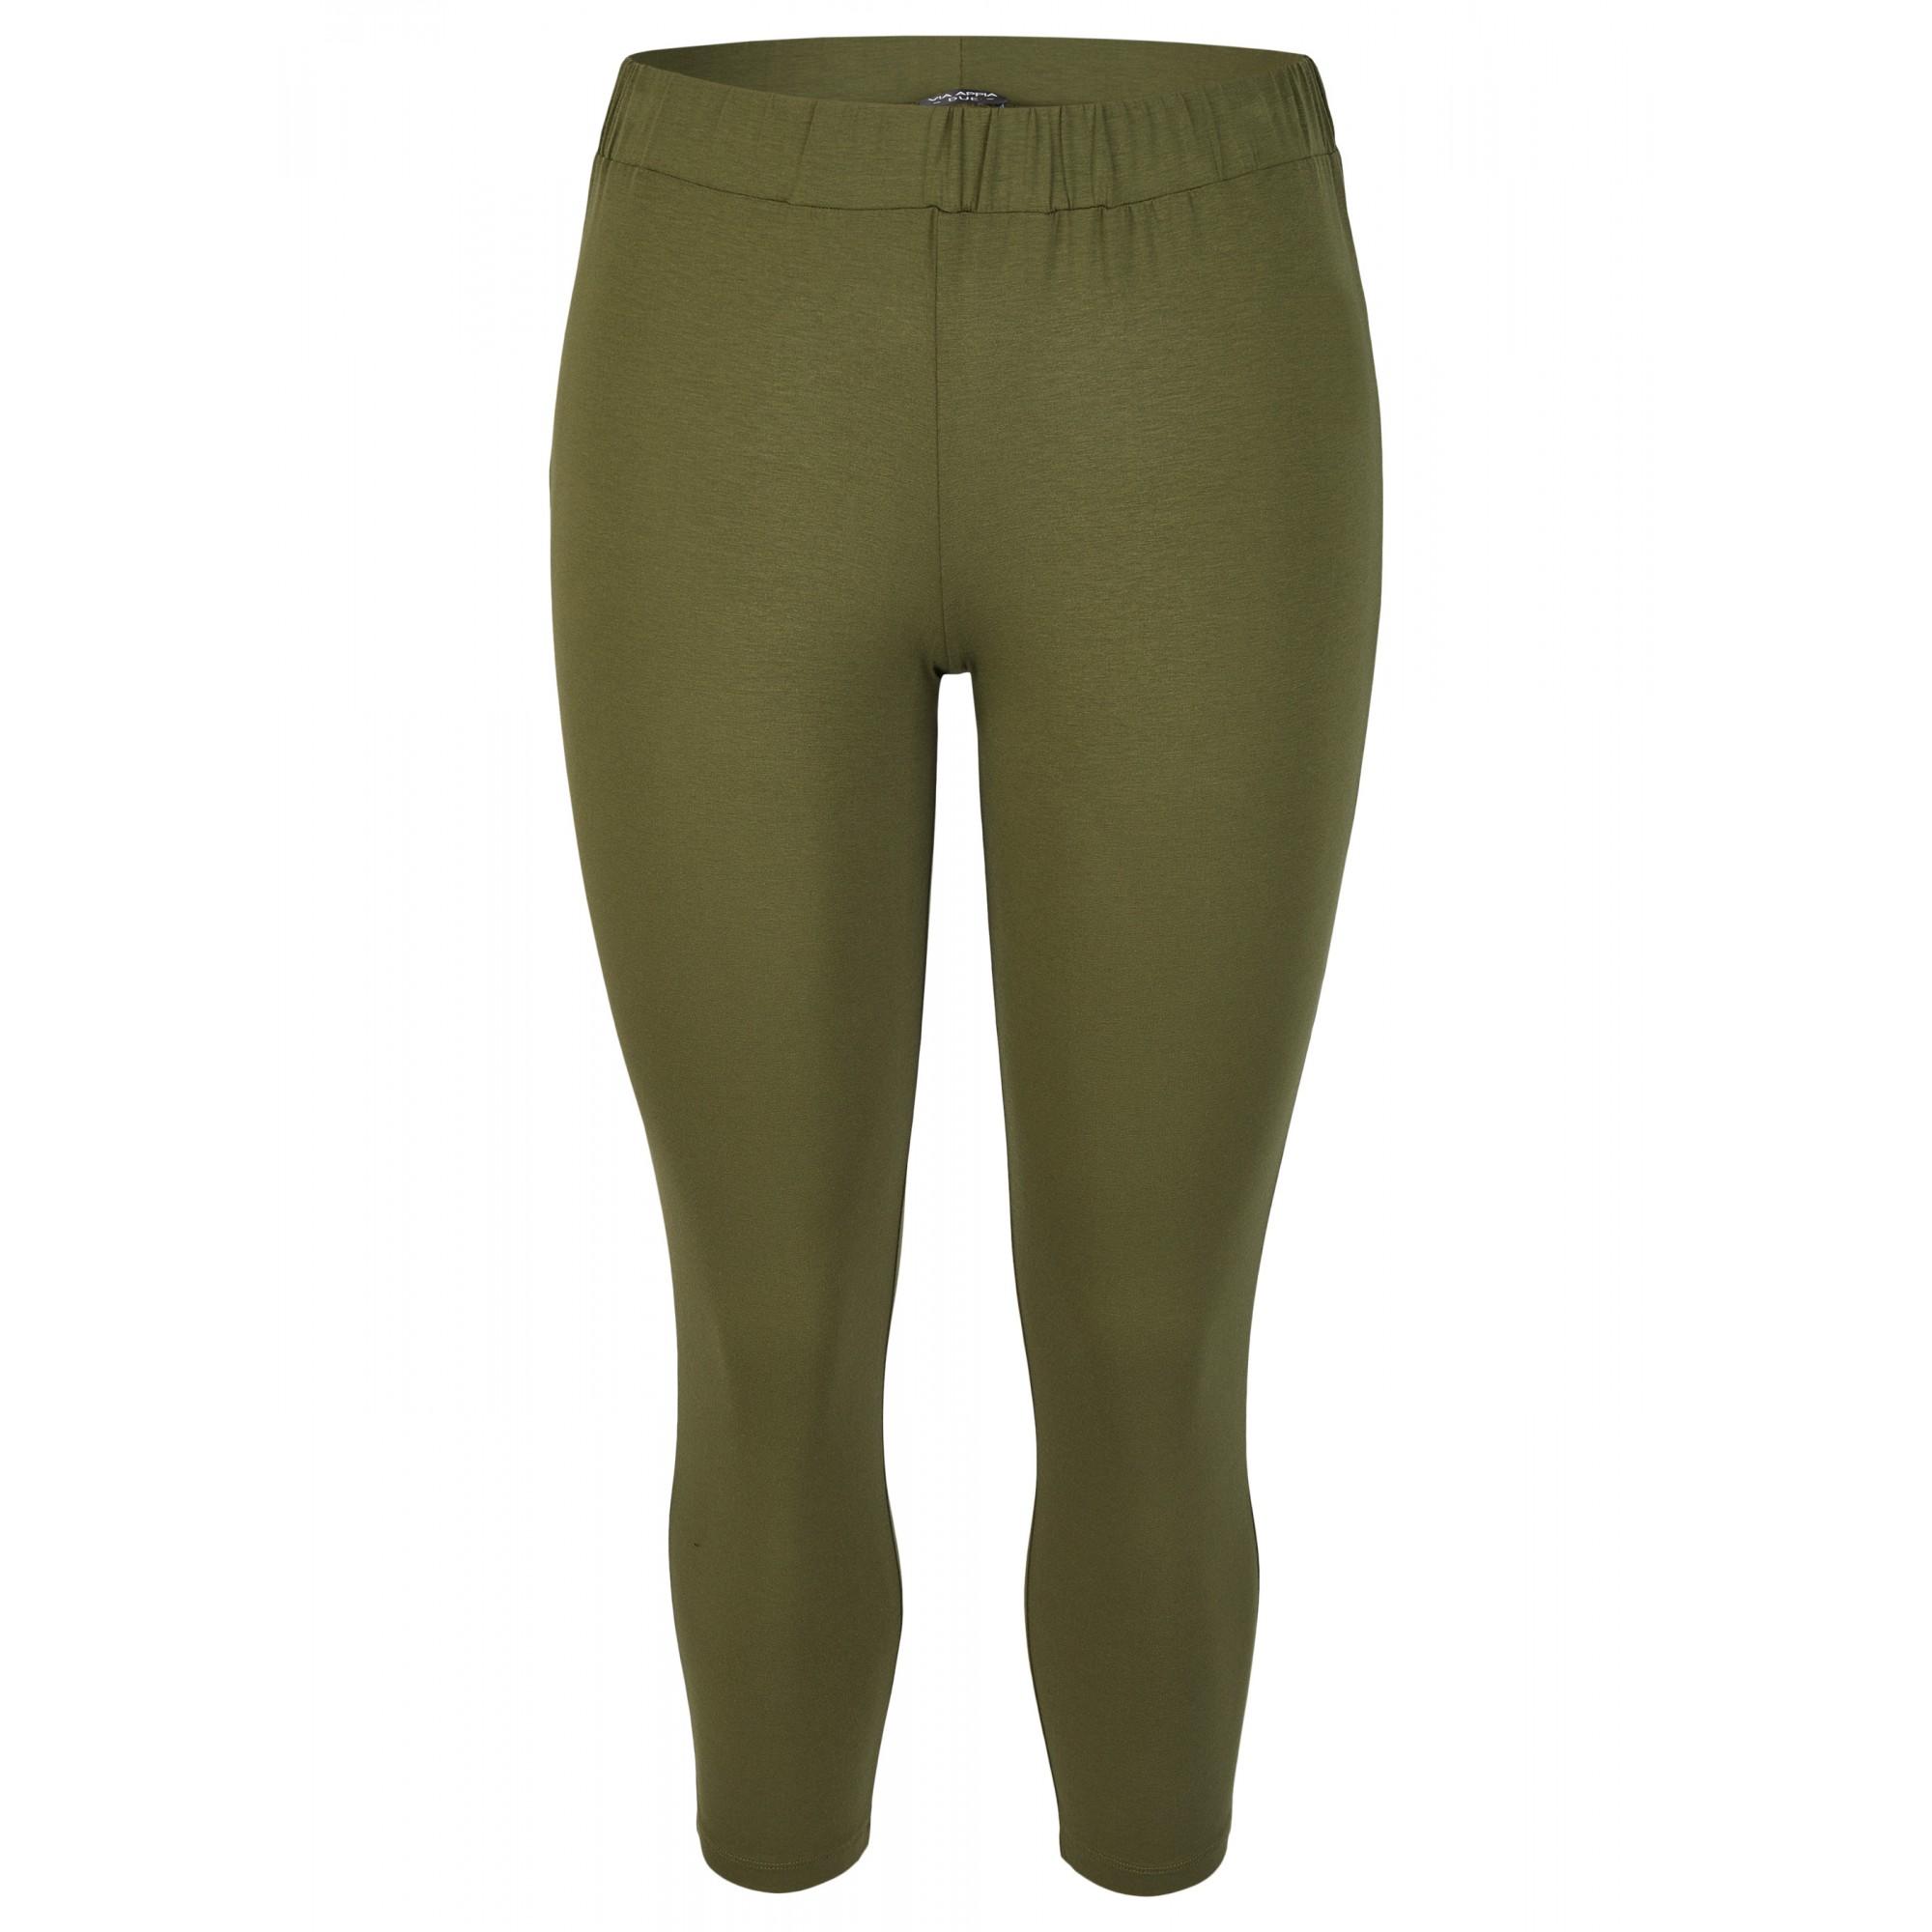 - Unifarbene Leggings